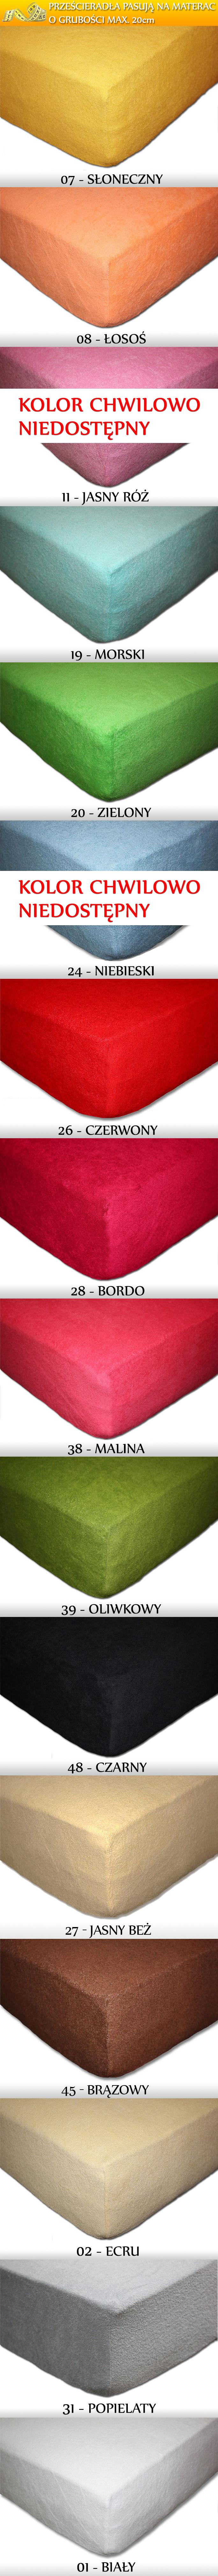 Kolory Frotte Gramatura: 200g/m2